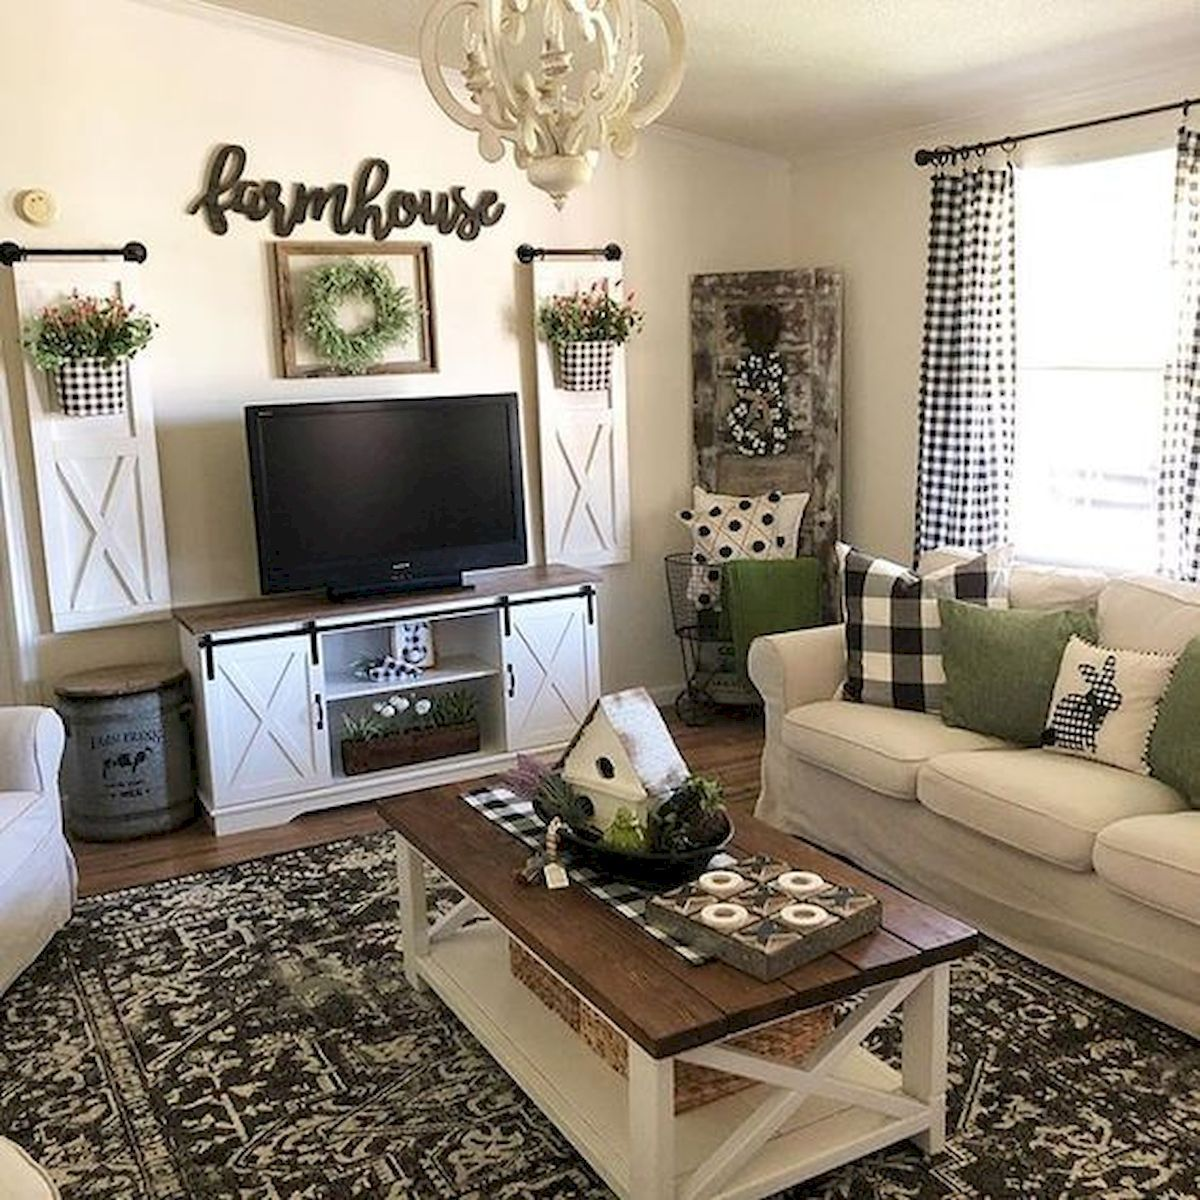 45 Creative Living Room Design And Decor Ideas For Small Apart